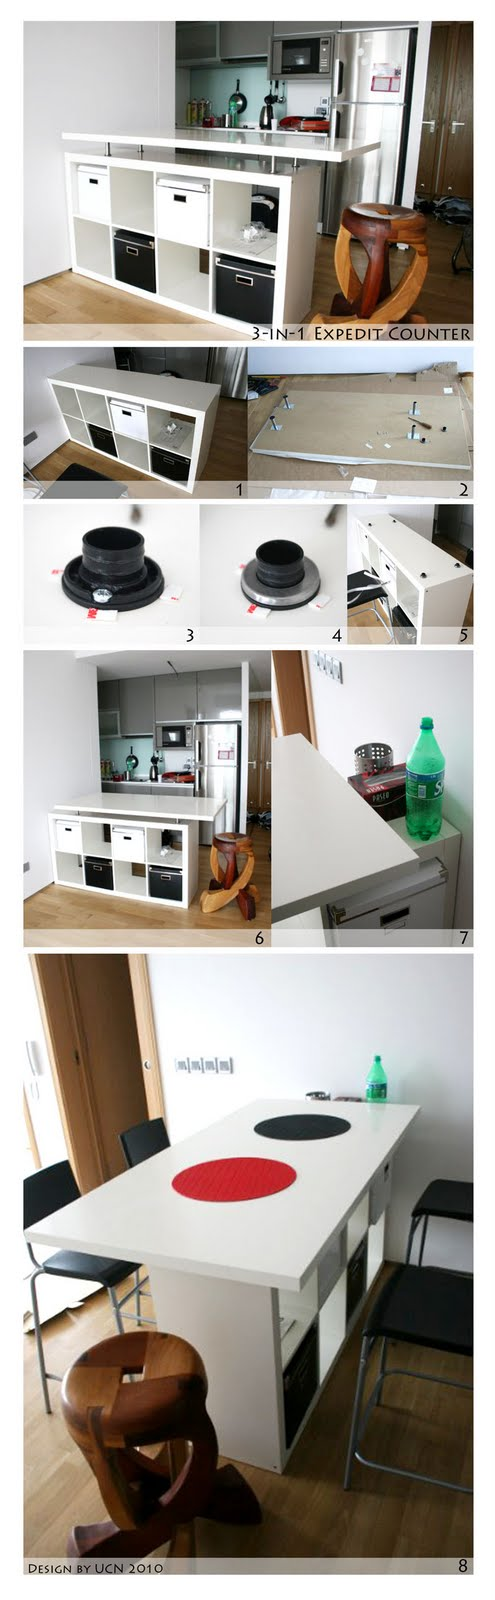 Expedit Kitchen Counter